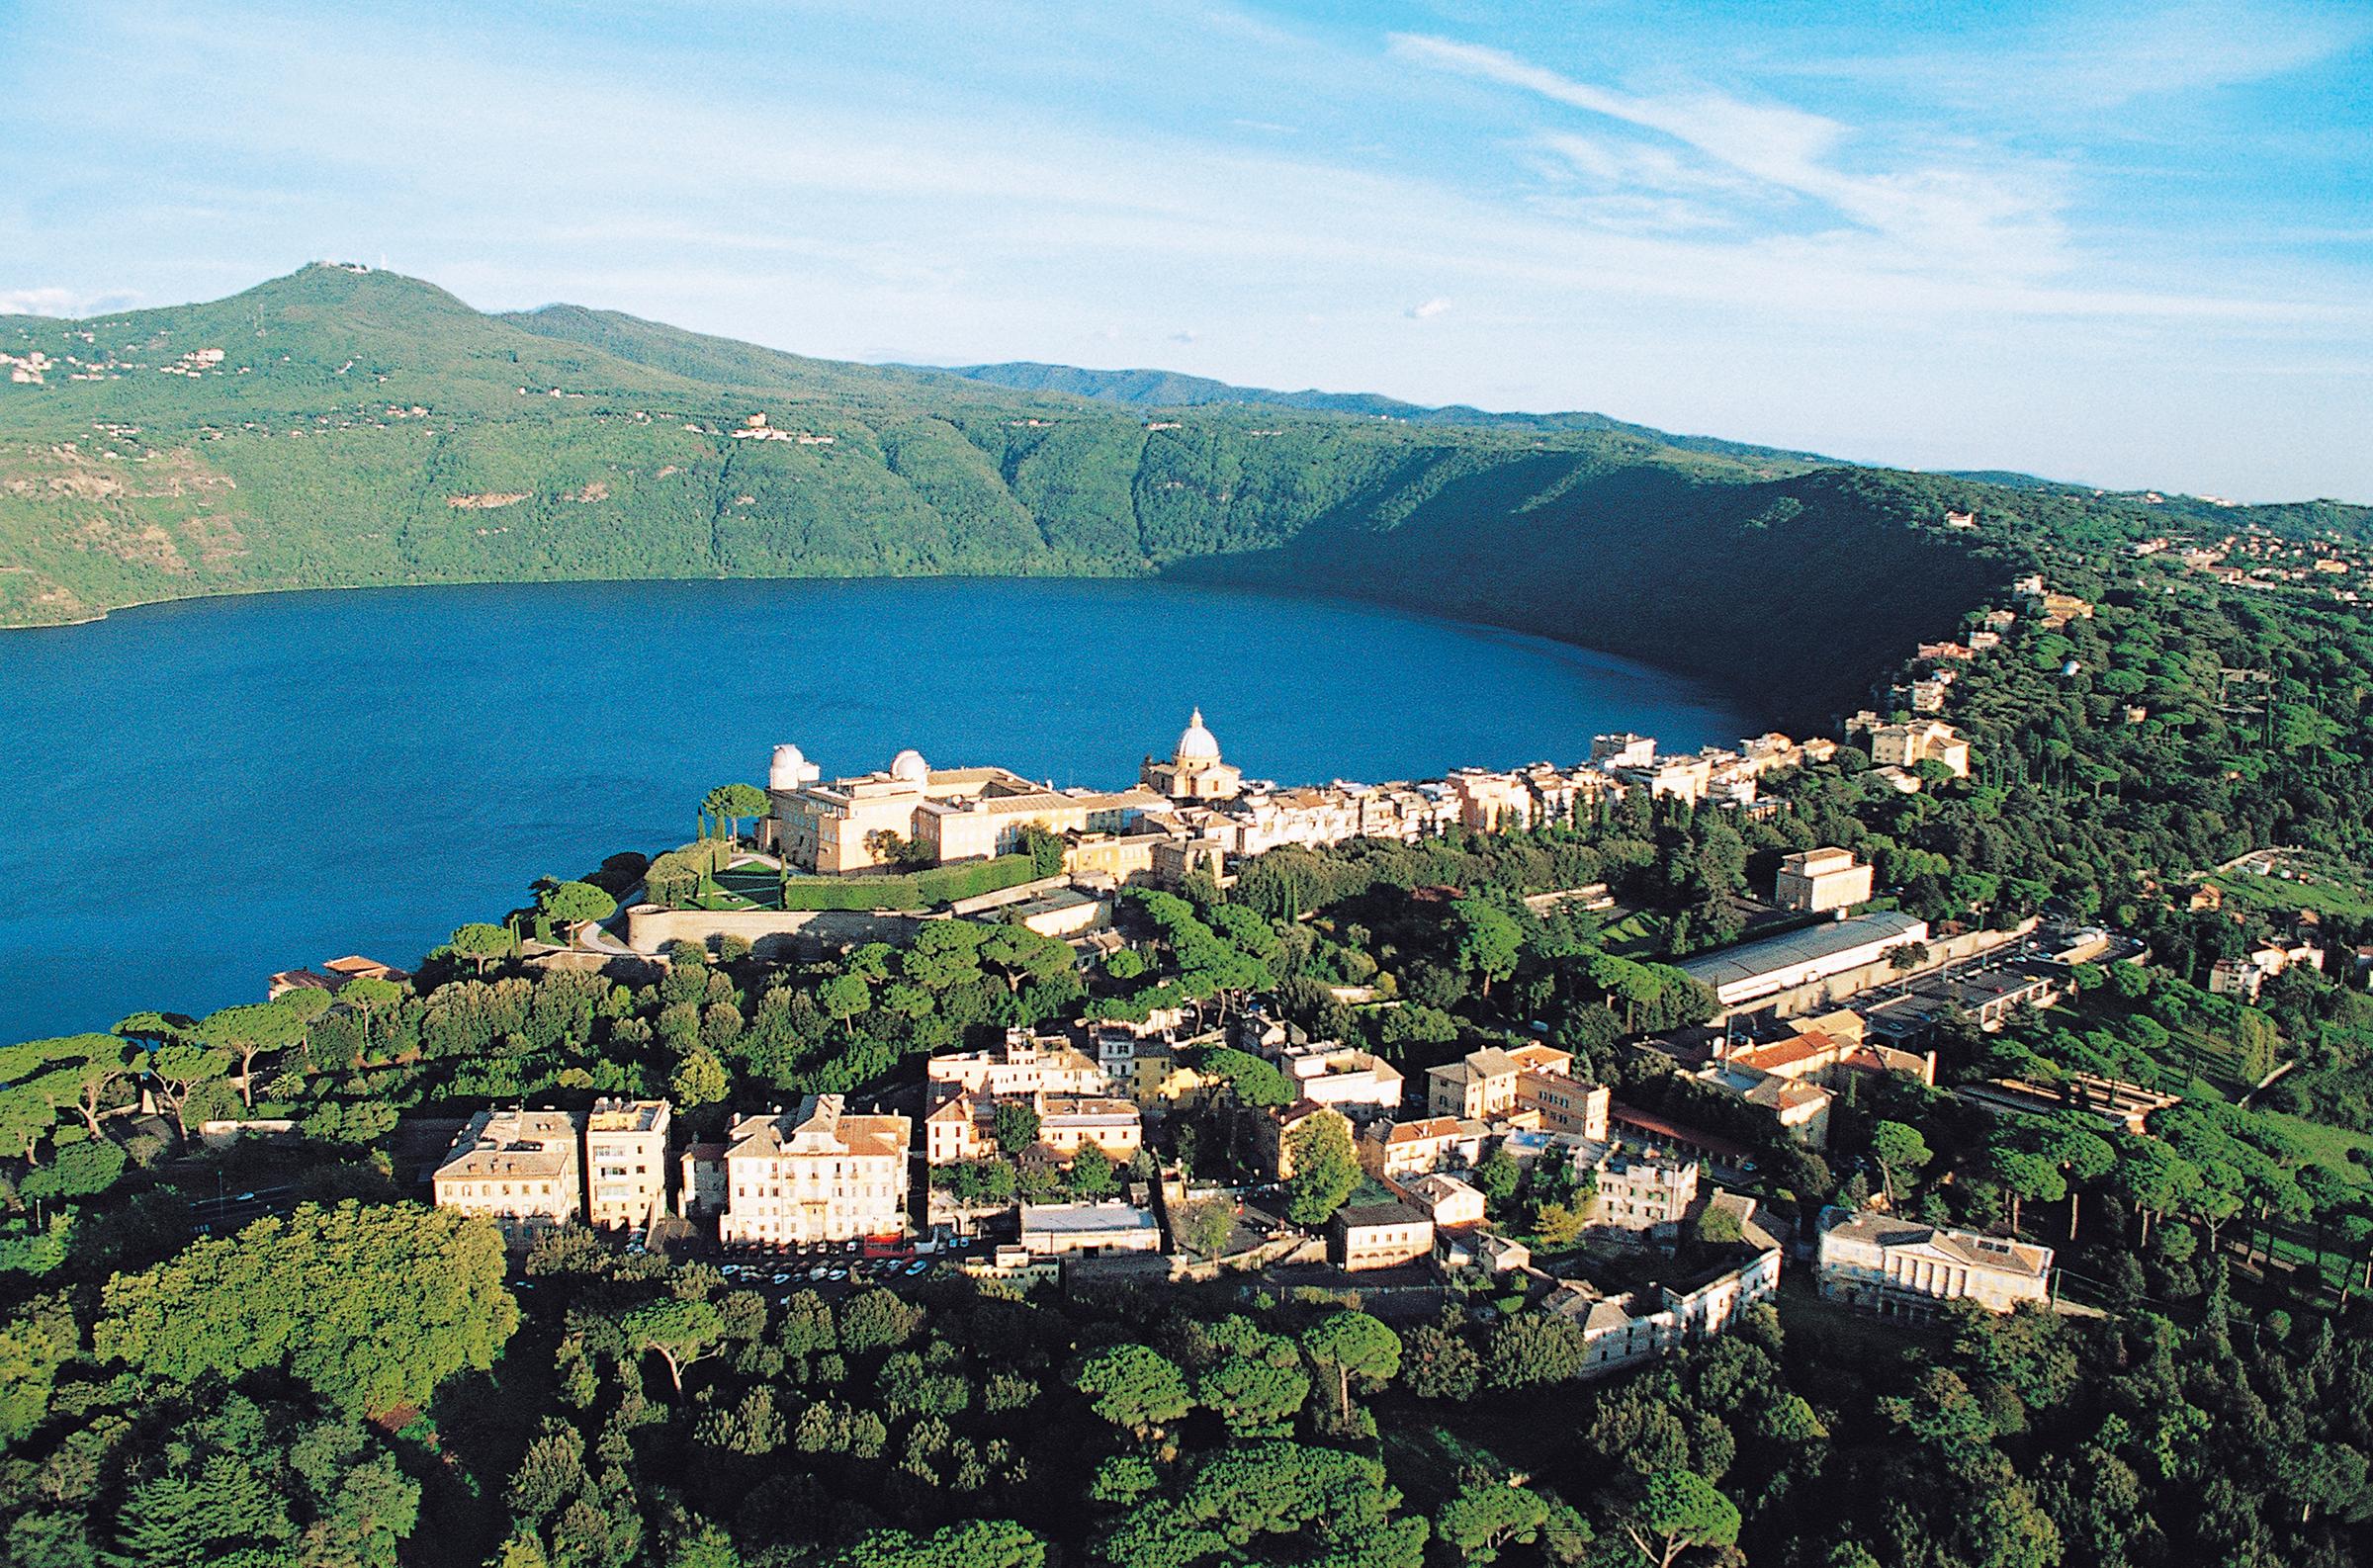 Aerial view of Castel Gandolfo, Lake Albano and the Alban Hills, Lazio, Italy.